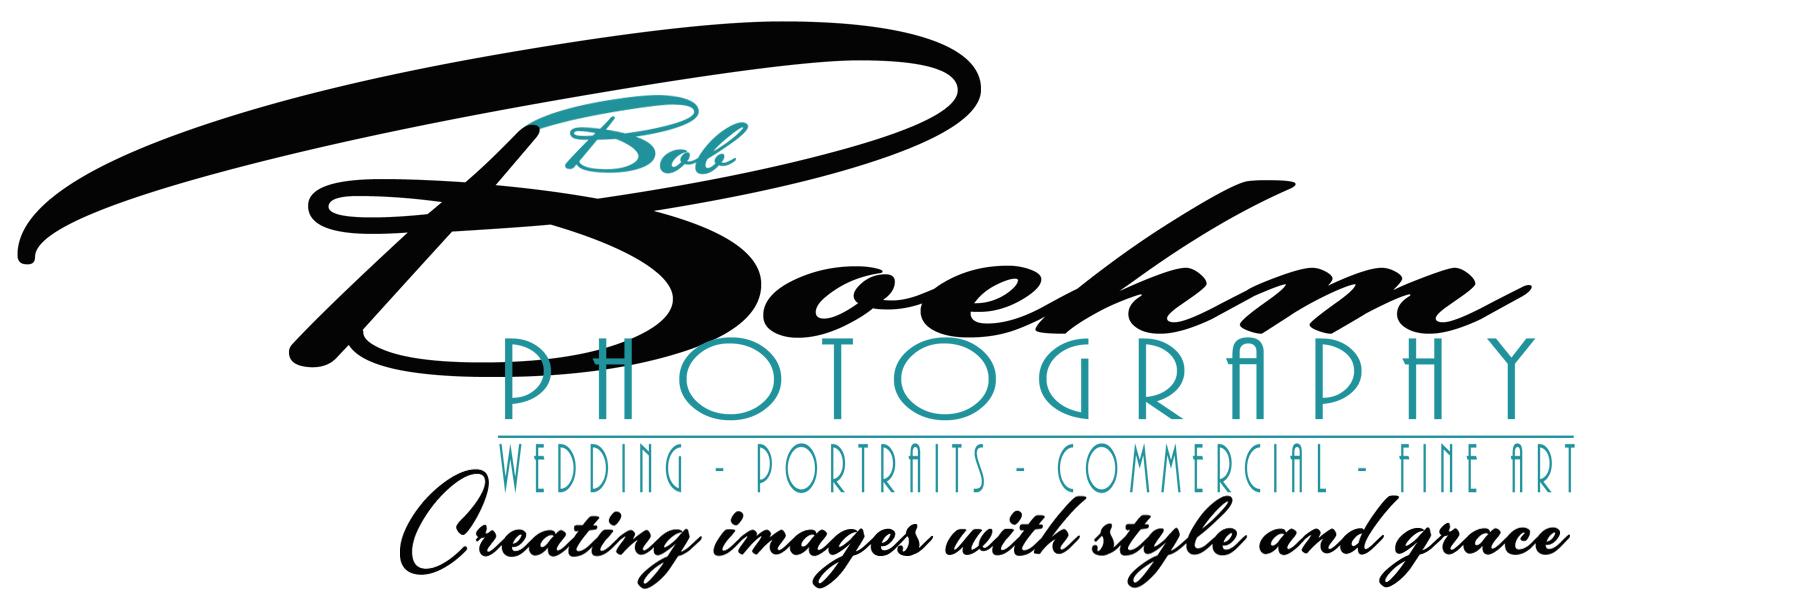 Bob Boehm Photography